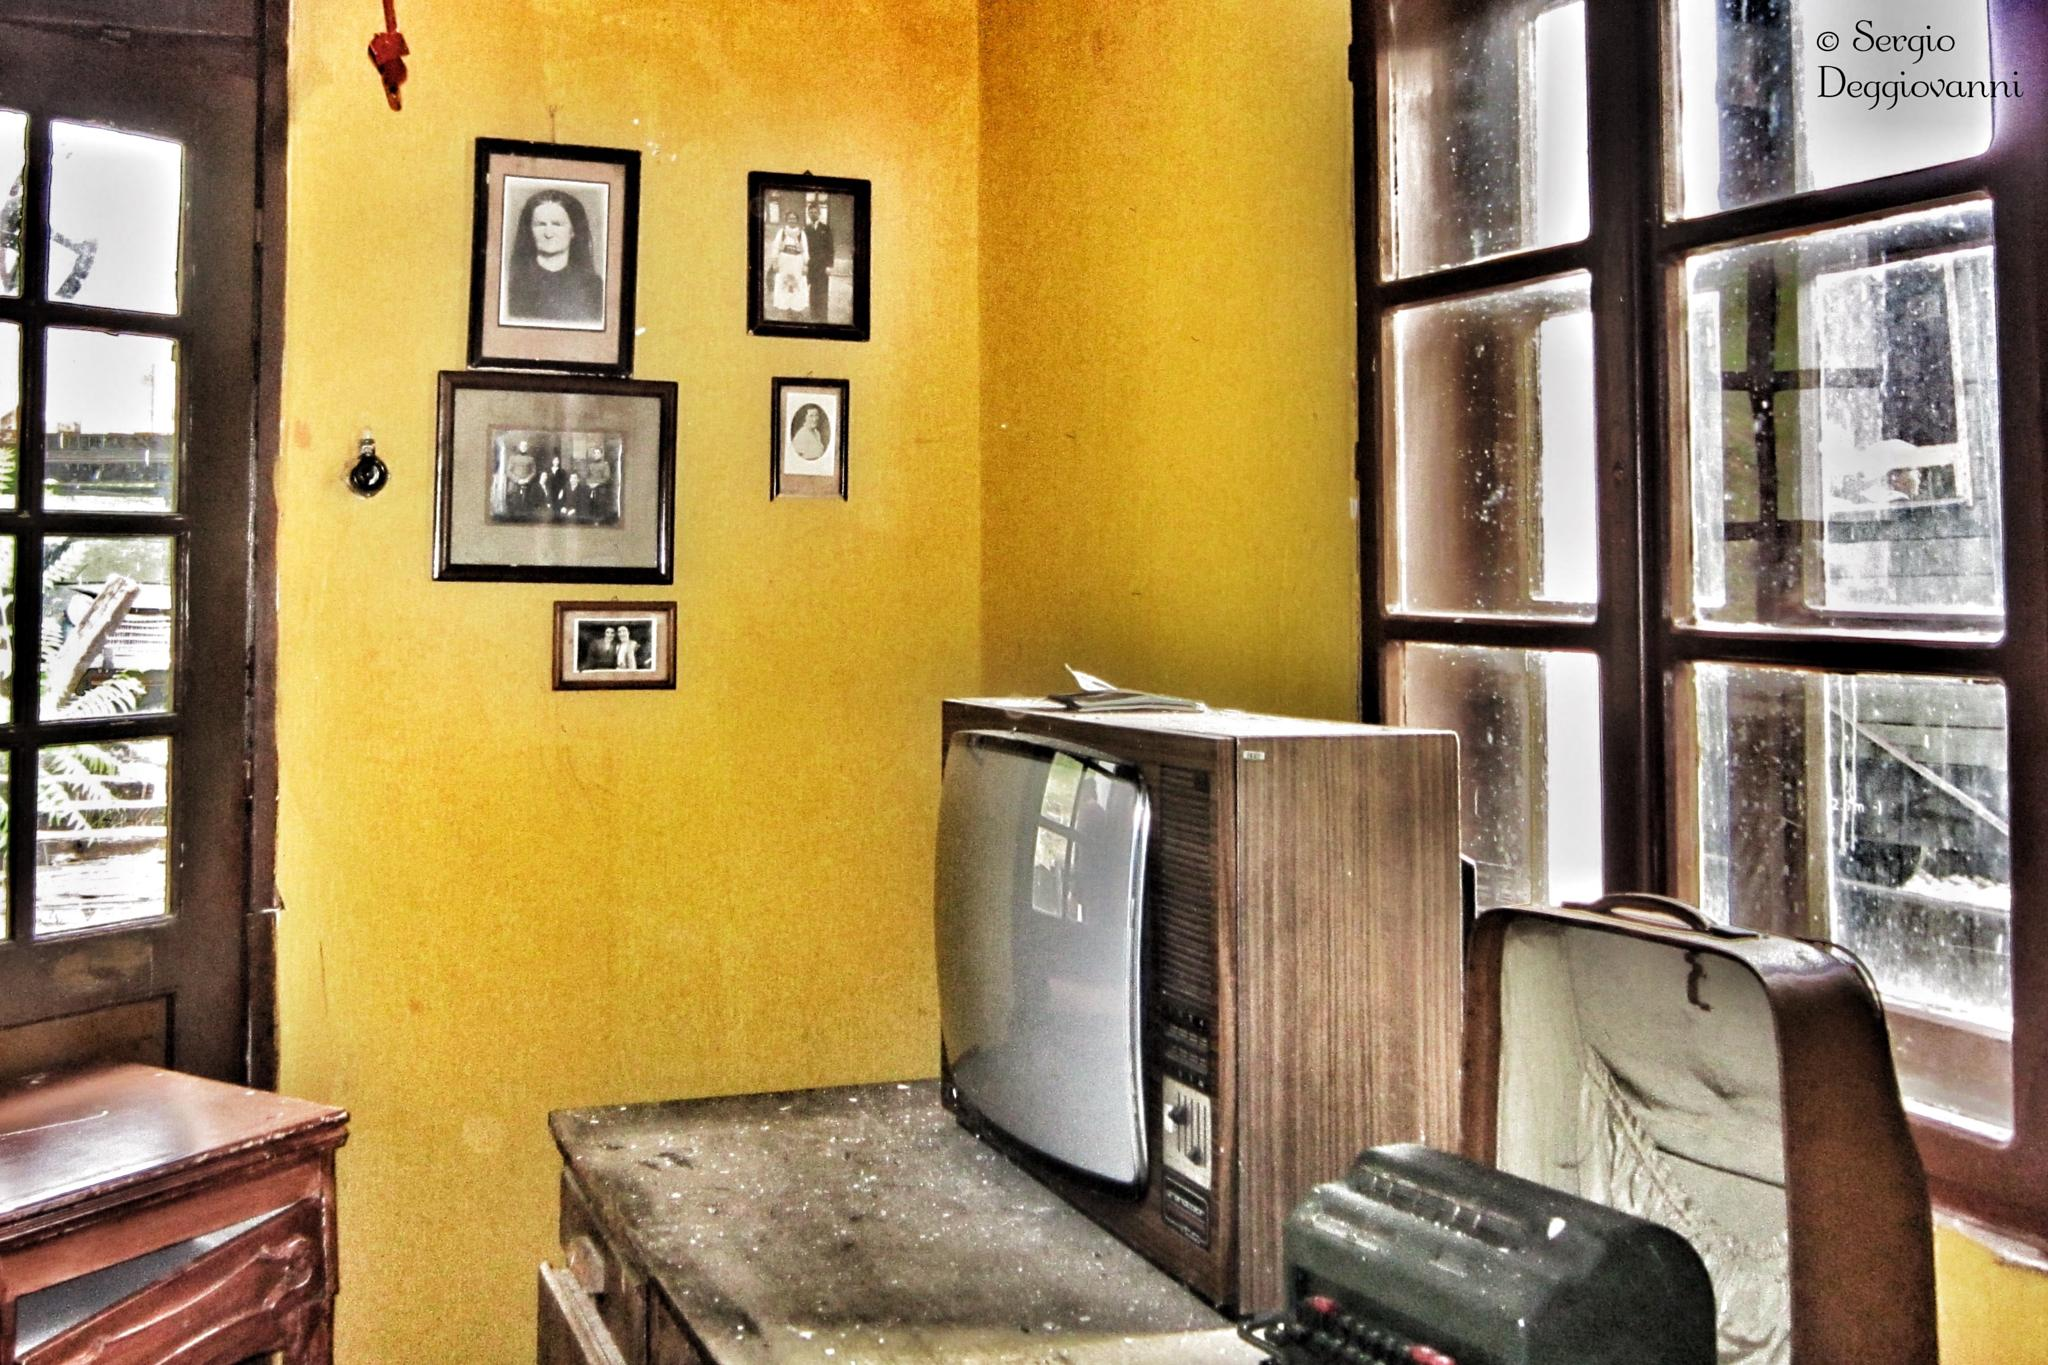 Abandoned movie set no. 1 by Sergio Deggiovanni